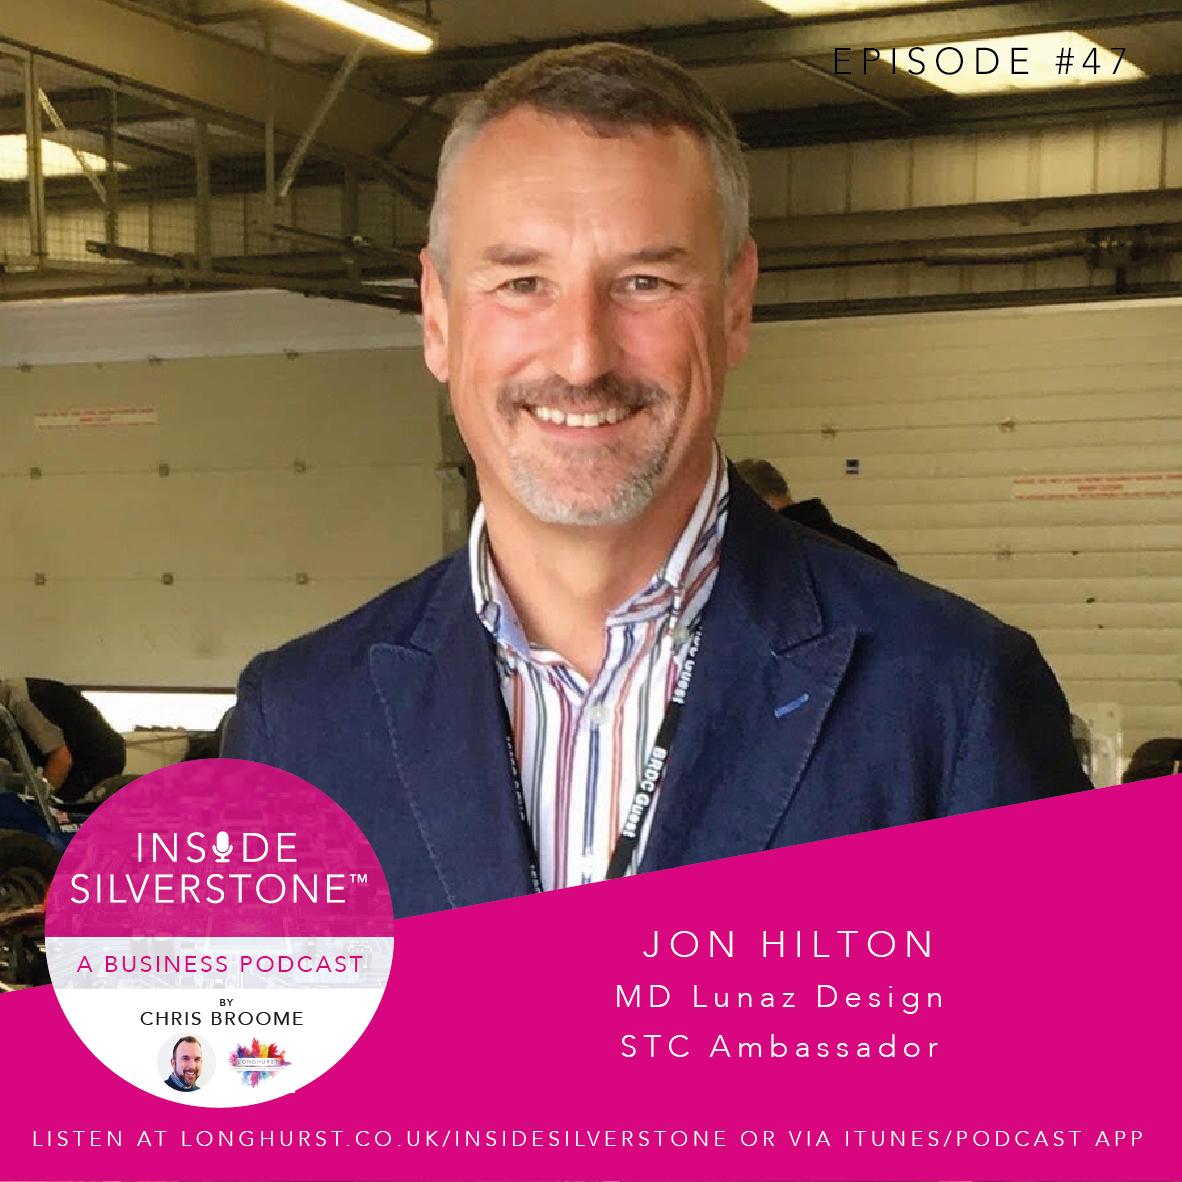 Jon Hilton, MD of Lunaz Design & STC Ambassador